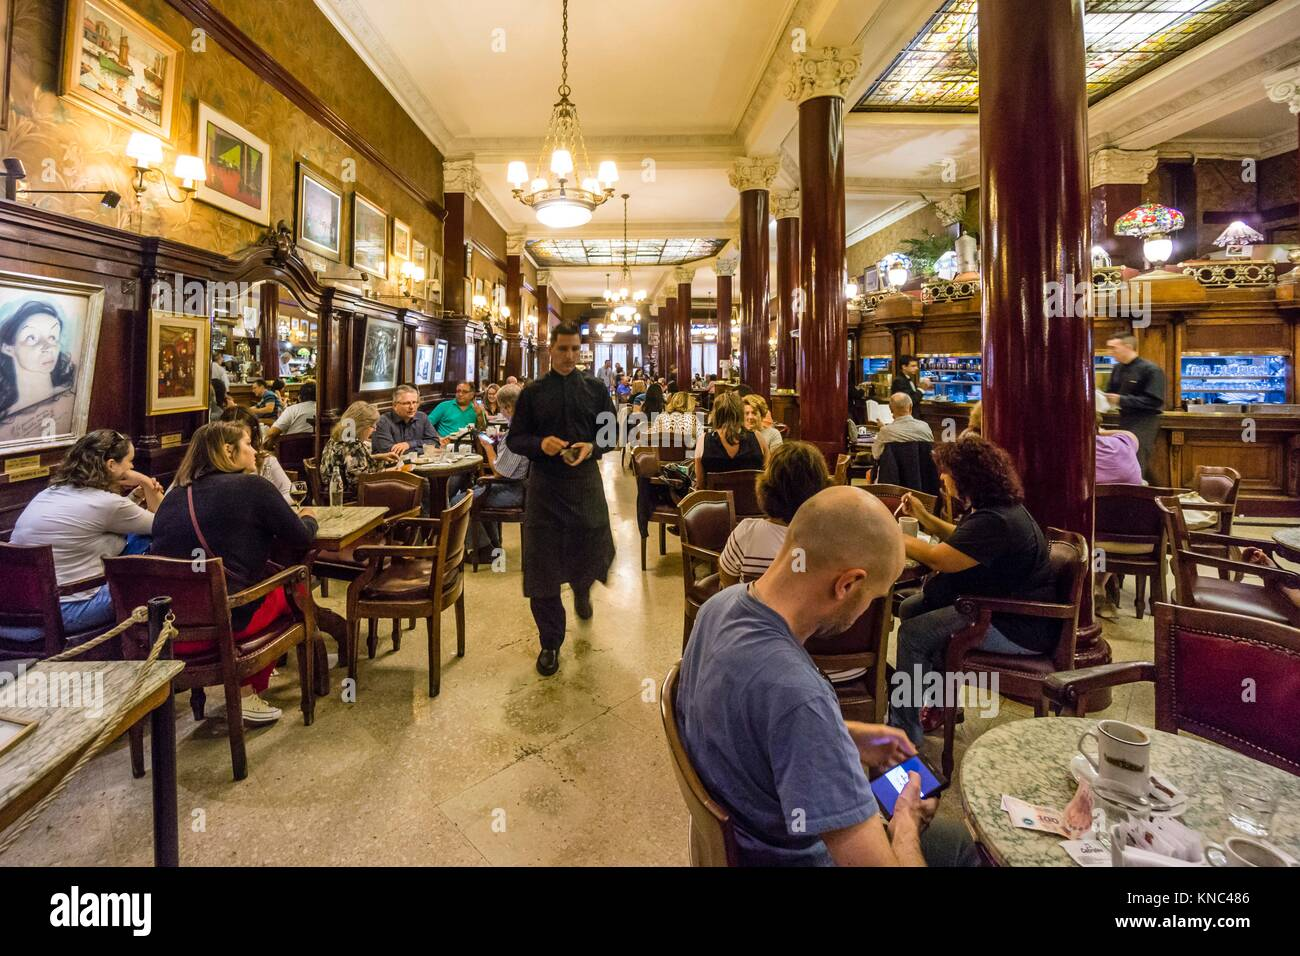 Nel Café Tortoni, 825 de la Avenida de Mayo, Buenos Aires, Argentina Immagini Stock